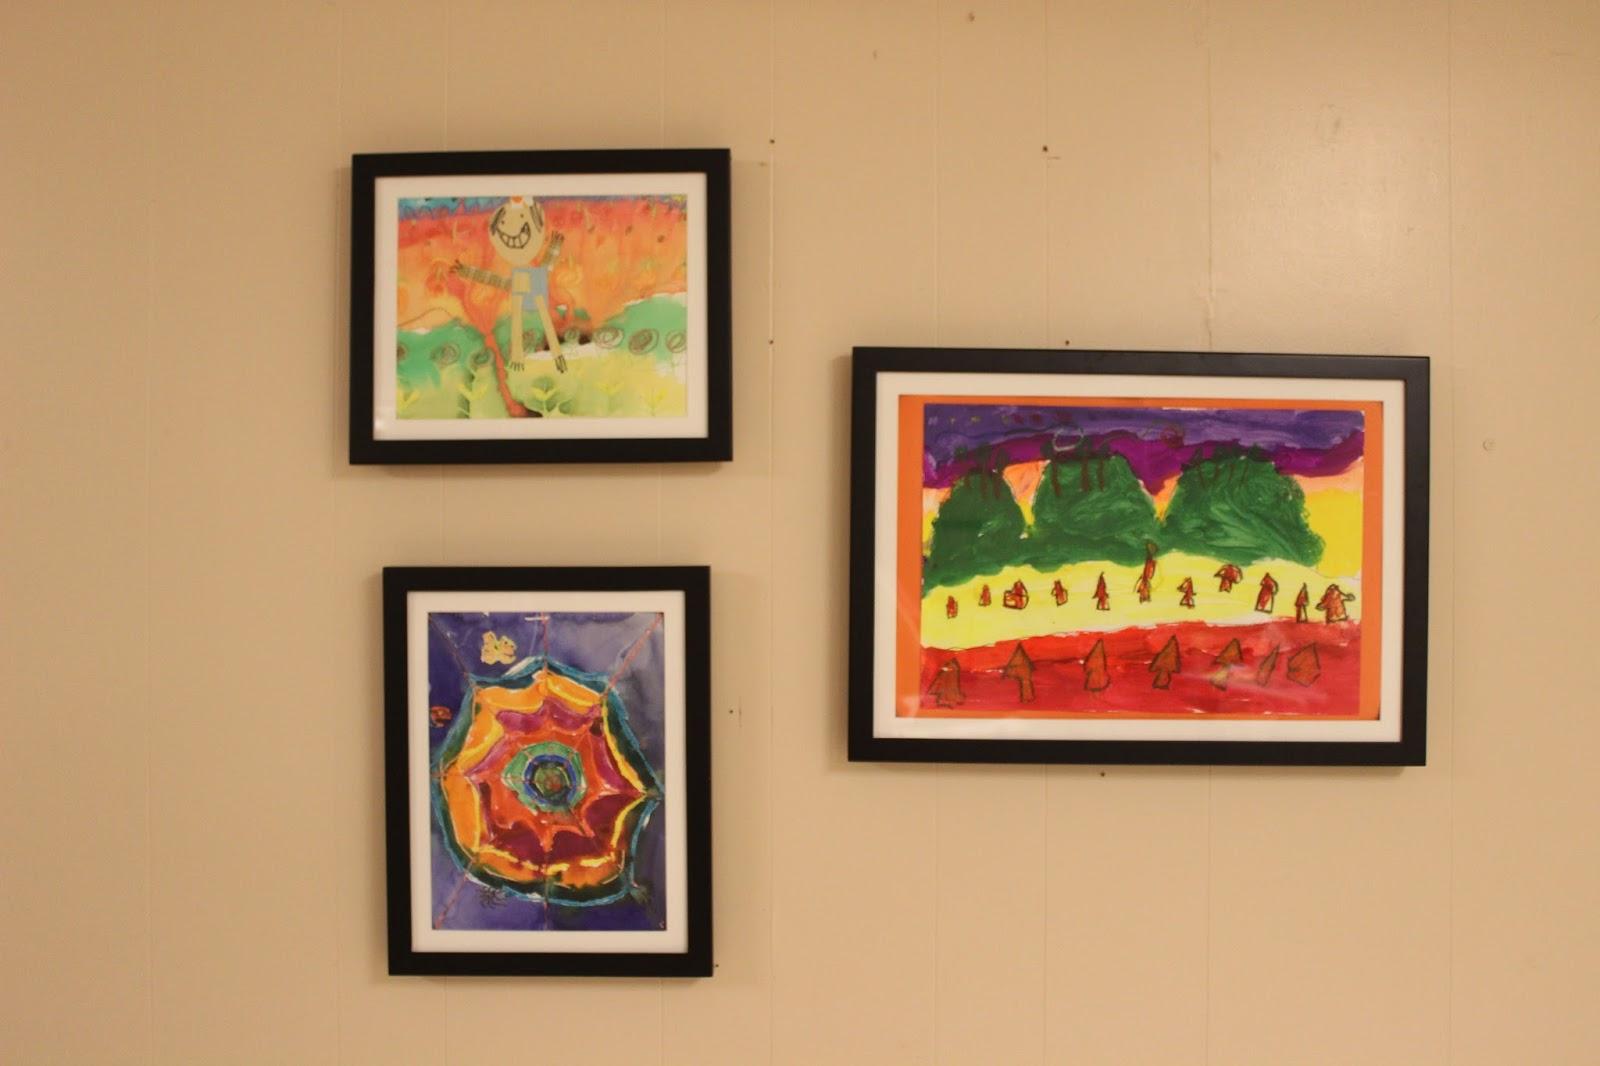 dynamic frames review of lil davinci art gallery - Dynamic Frames